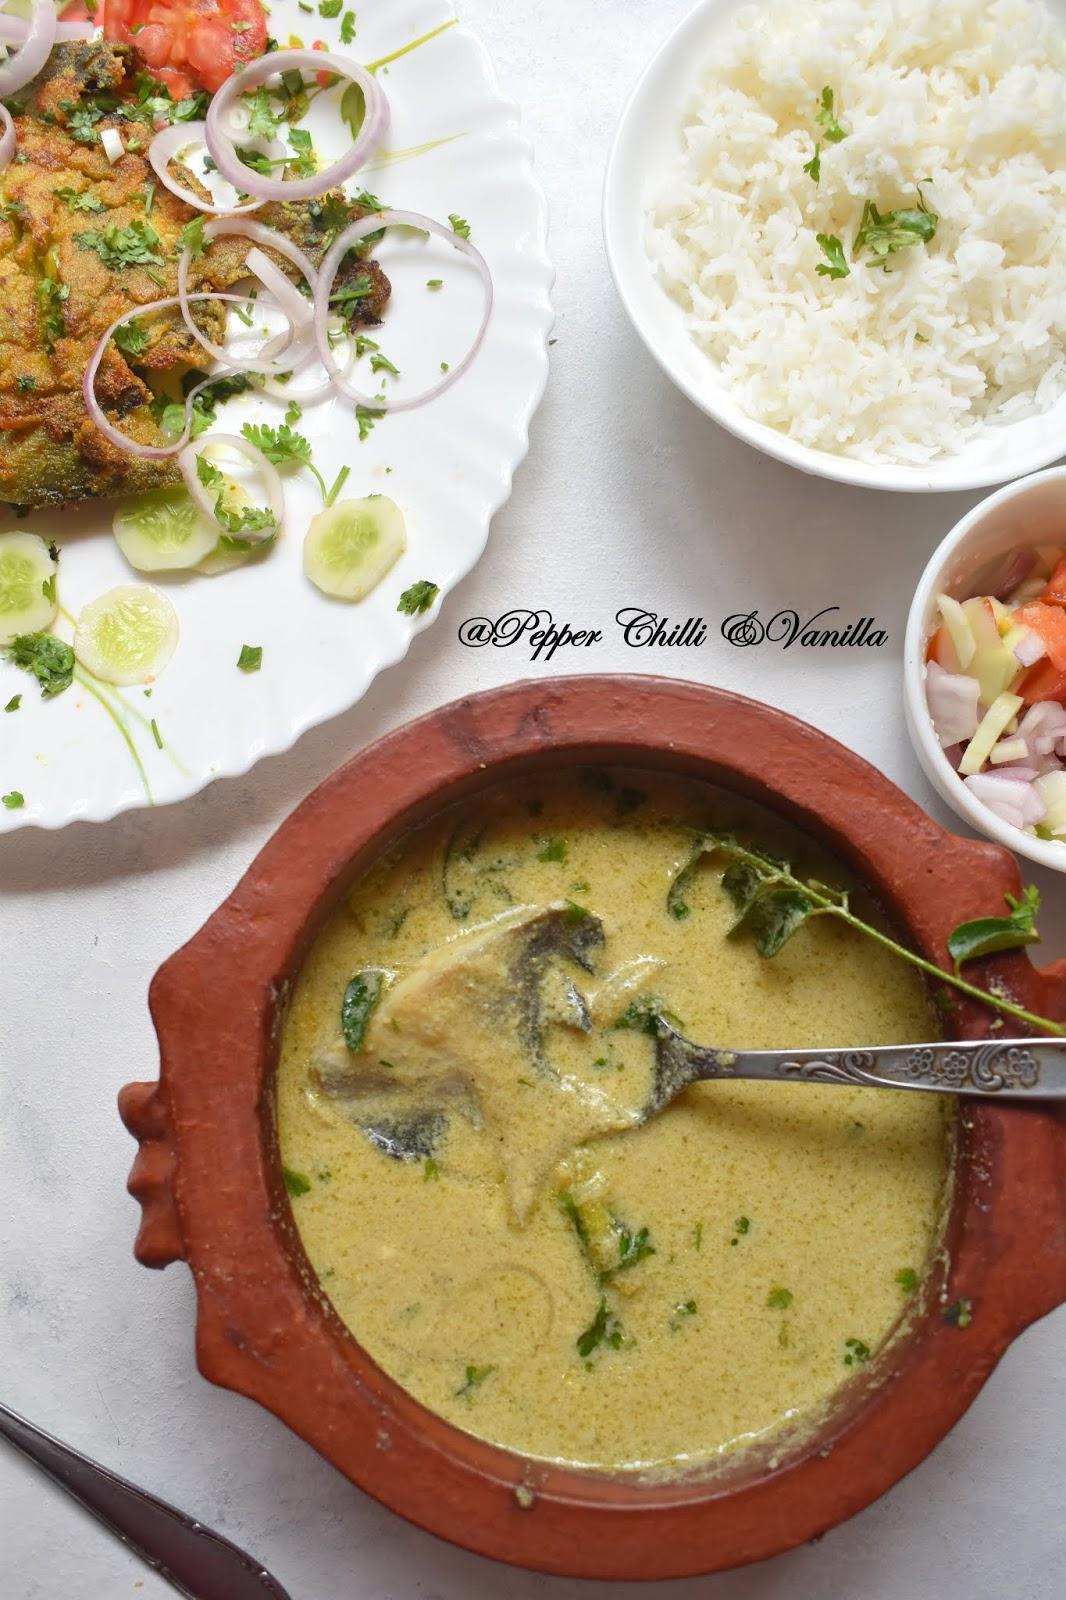 pomfret in coconut milk/pomfret coconut curry